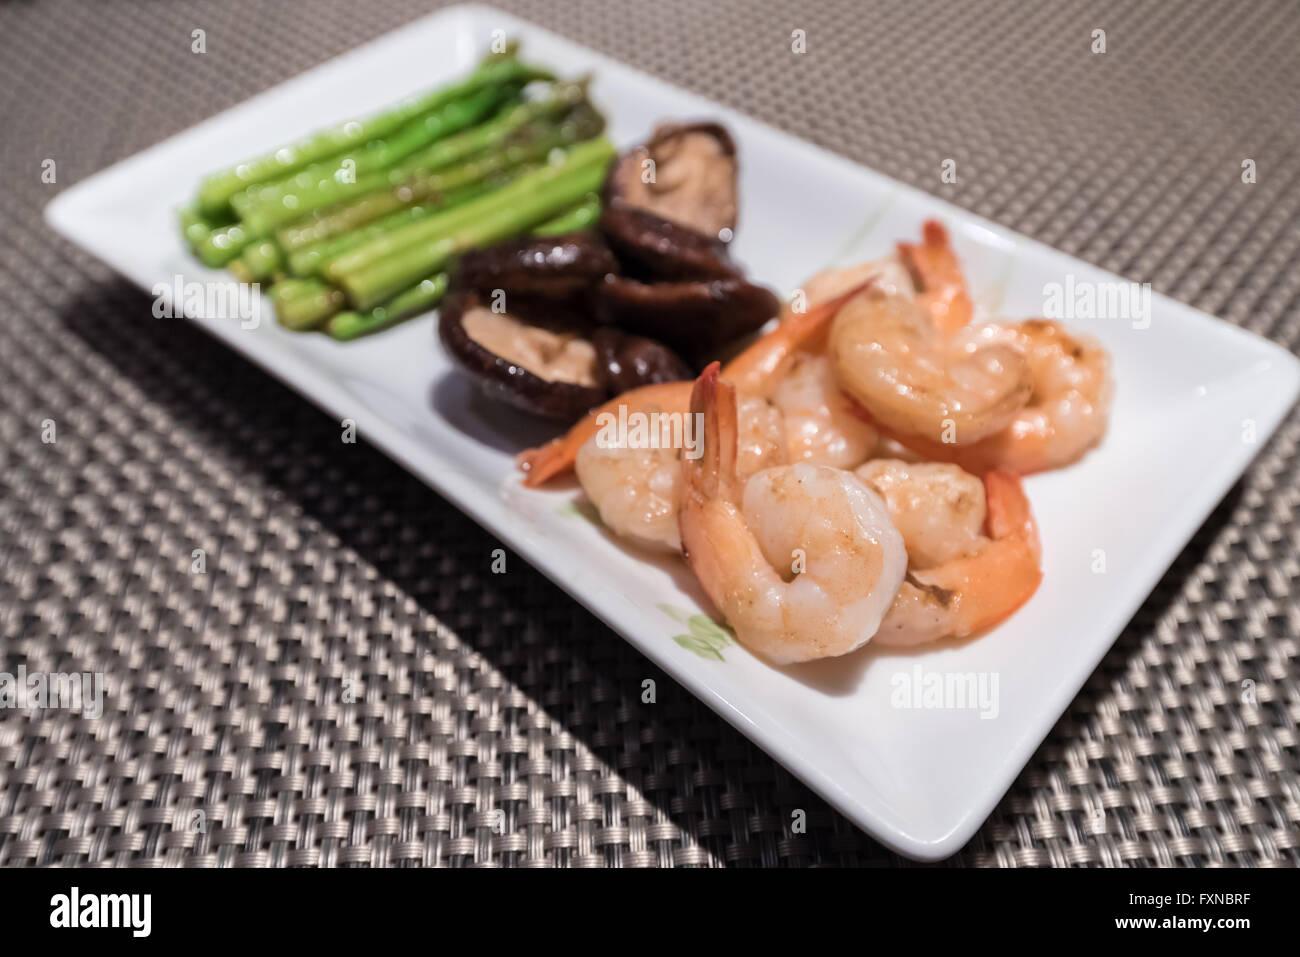 Prawns teppanyaki with asparagus and mushroom - Stock Image